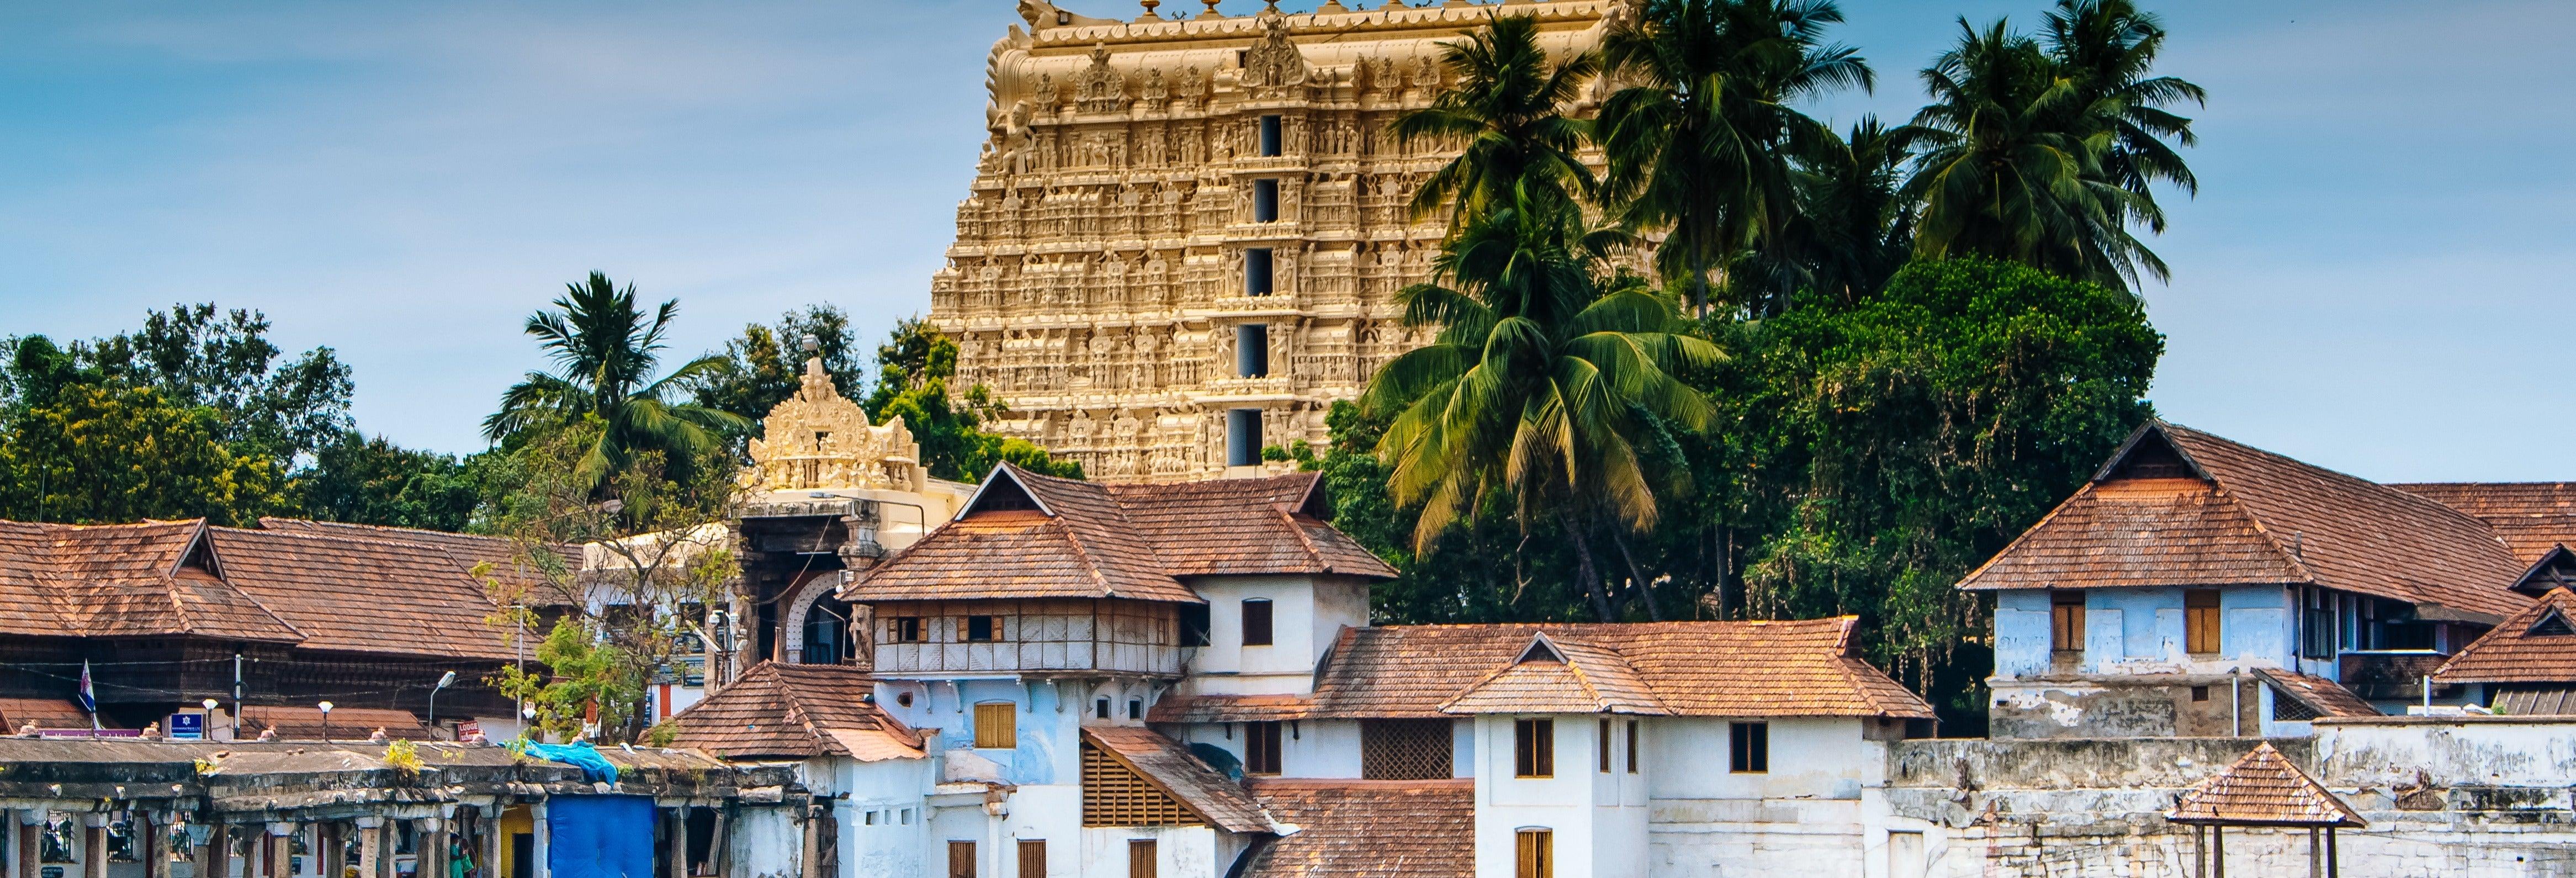 Tour dei templi di Thiruvananthapuram